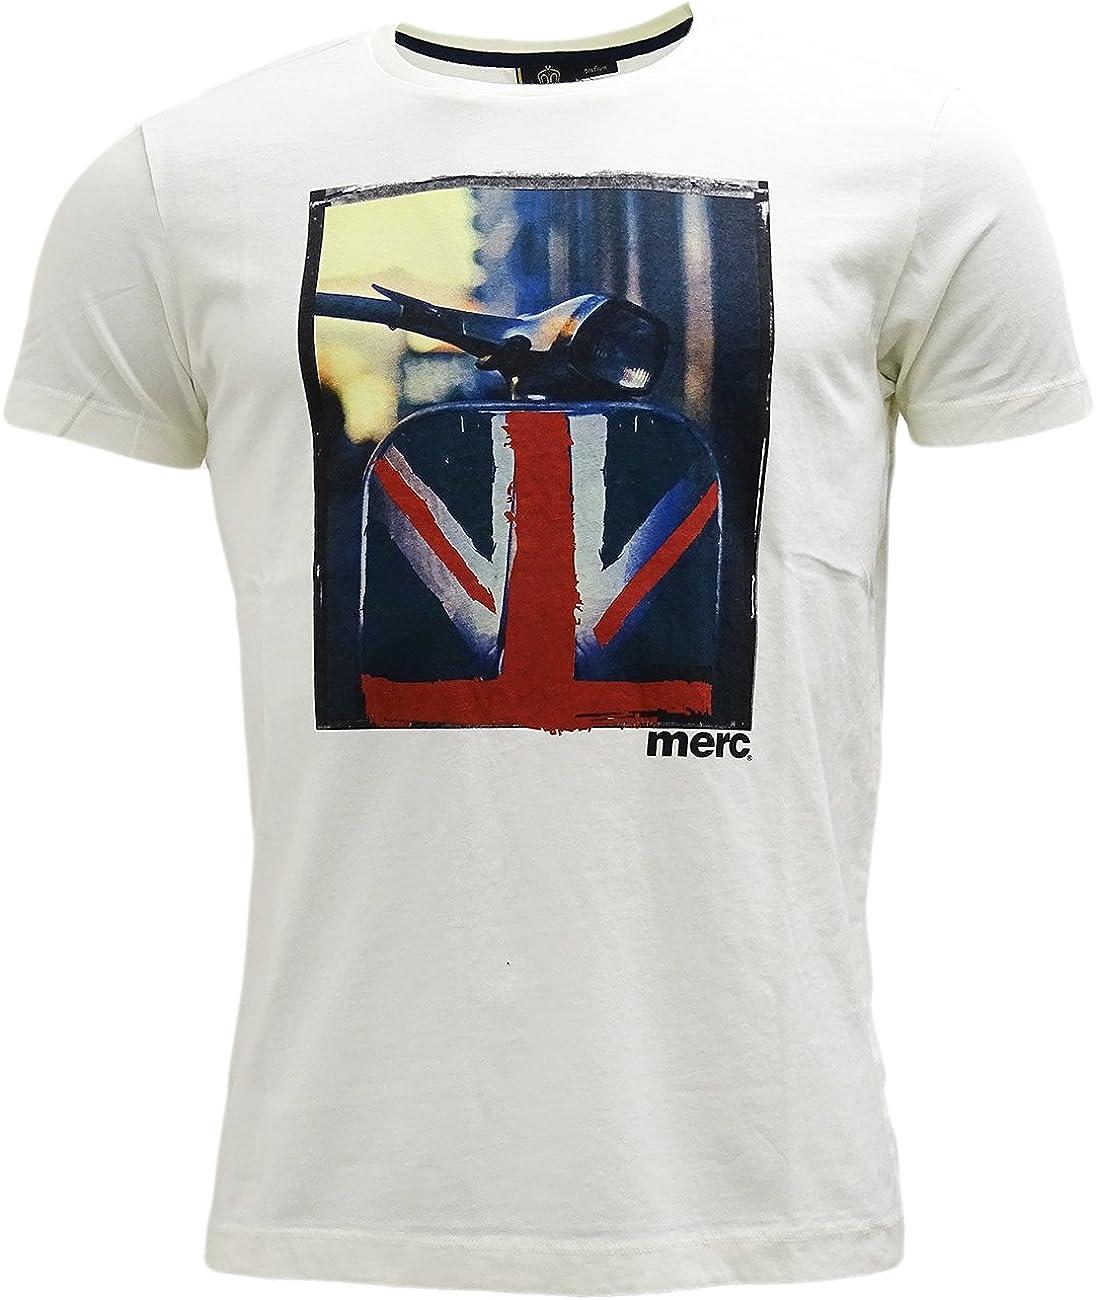 Merc London Spinner Scooter Print Camiseta en Off White Blanco Crema X-Large: Amazon.es: Ropa y accesorios